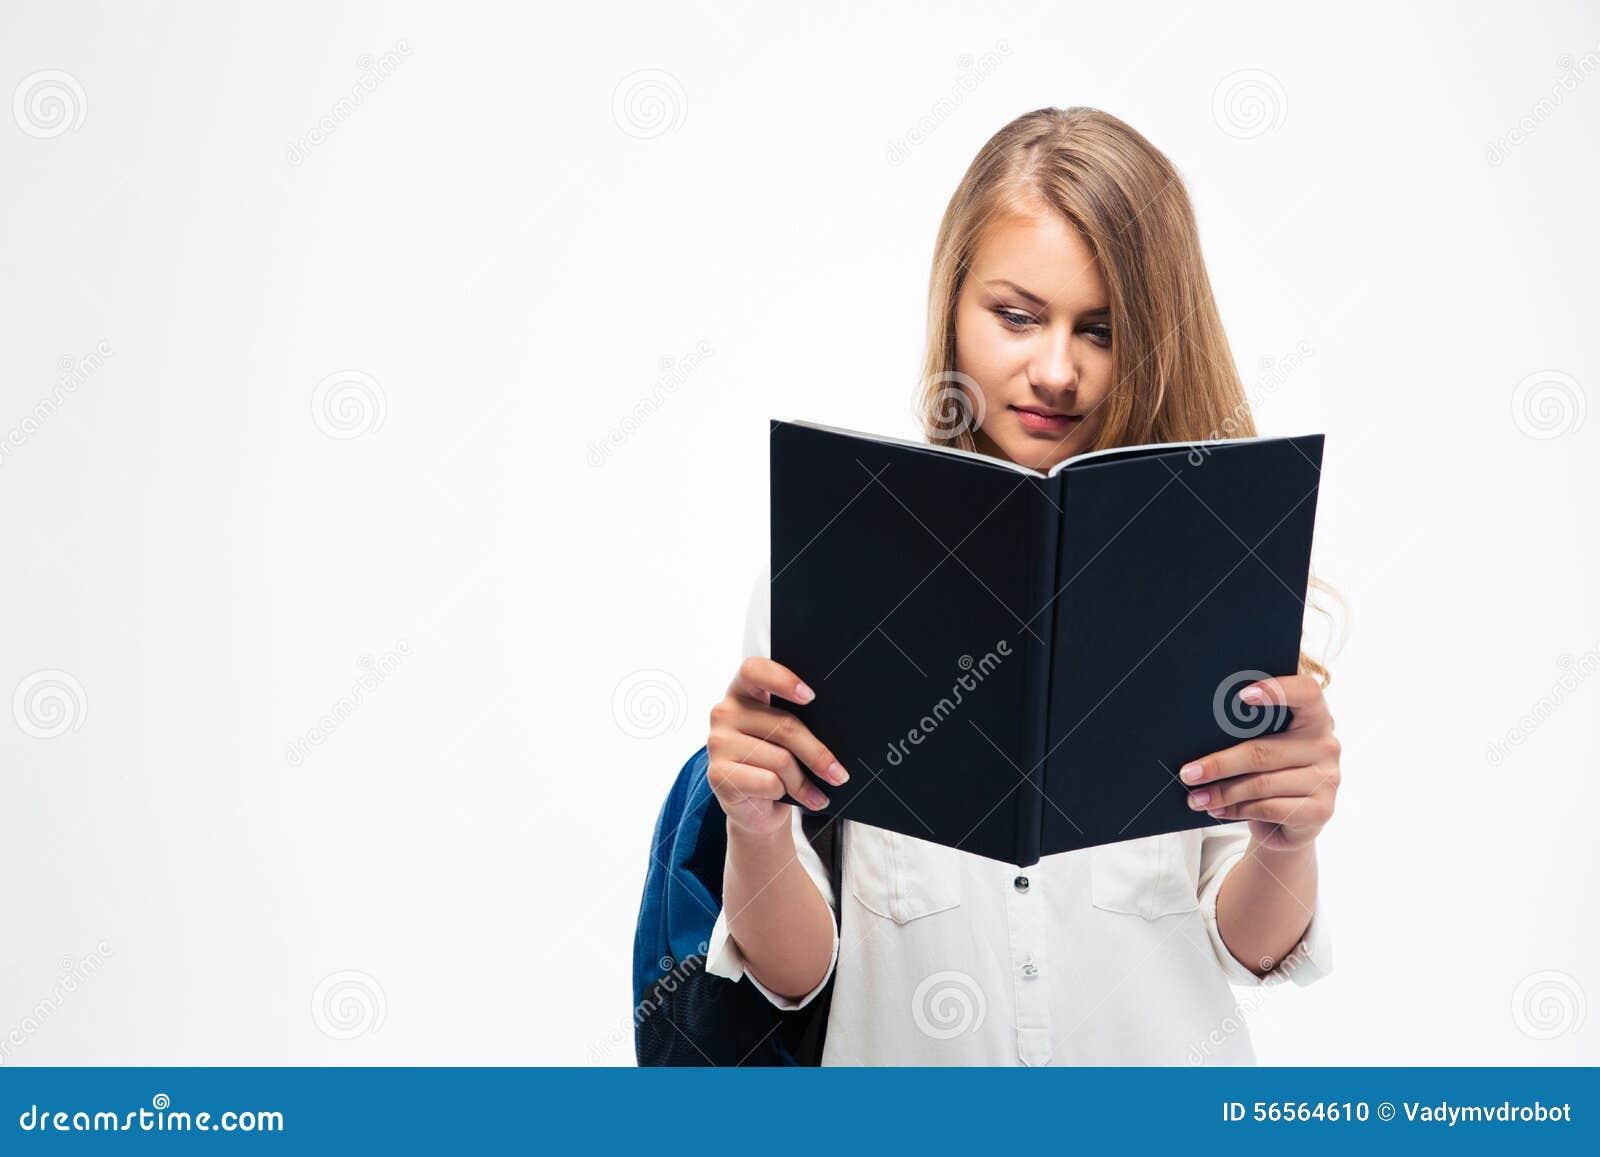 Download Γυναίκα σπουδαστής με το βιβλίο ανάγνωσης σακιδίων πλάτης Στοκ Εικόνες - εικόνα από ανασκόπησης, κορίτσι: 56564610